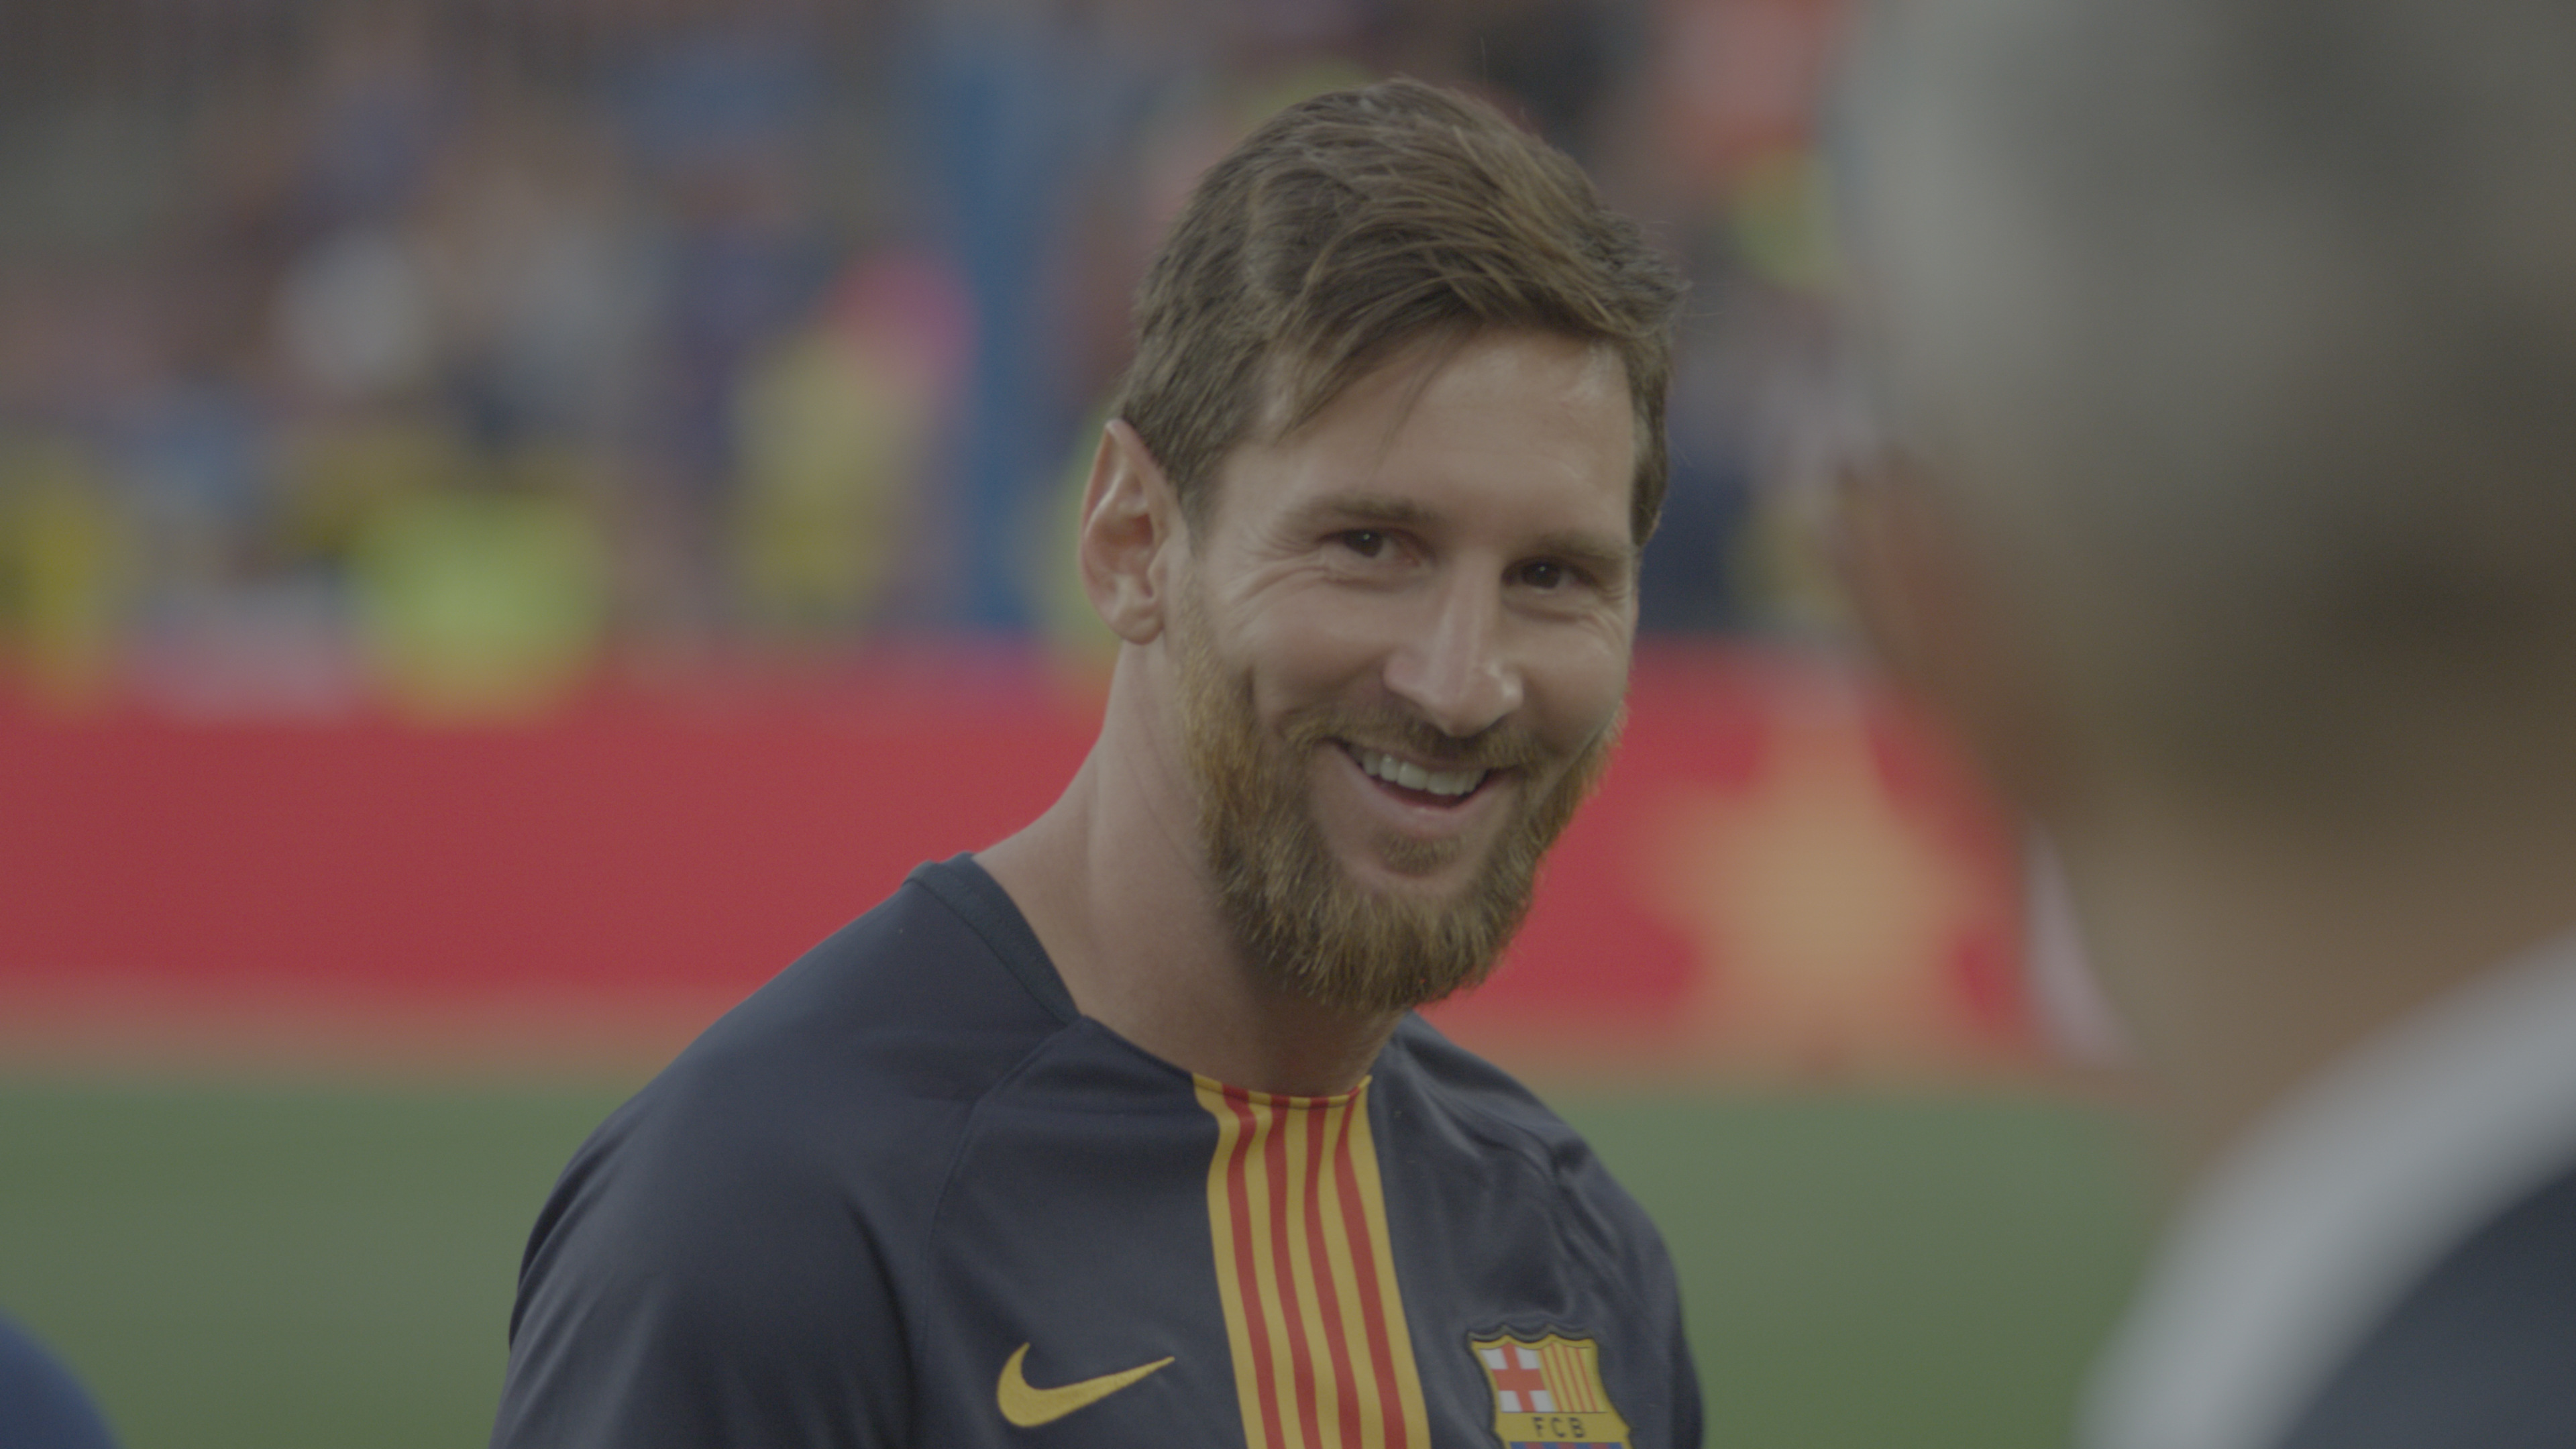 Lionel Messi - IMDb